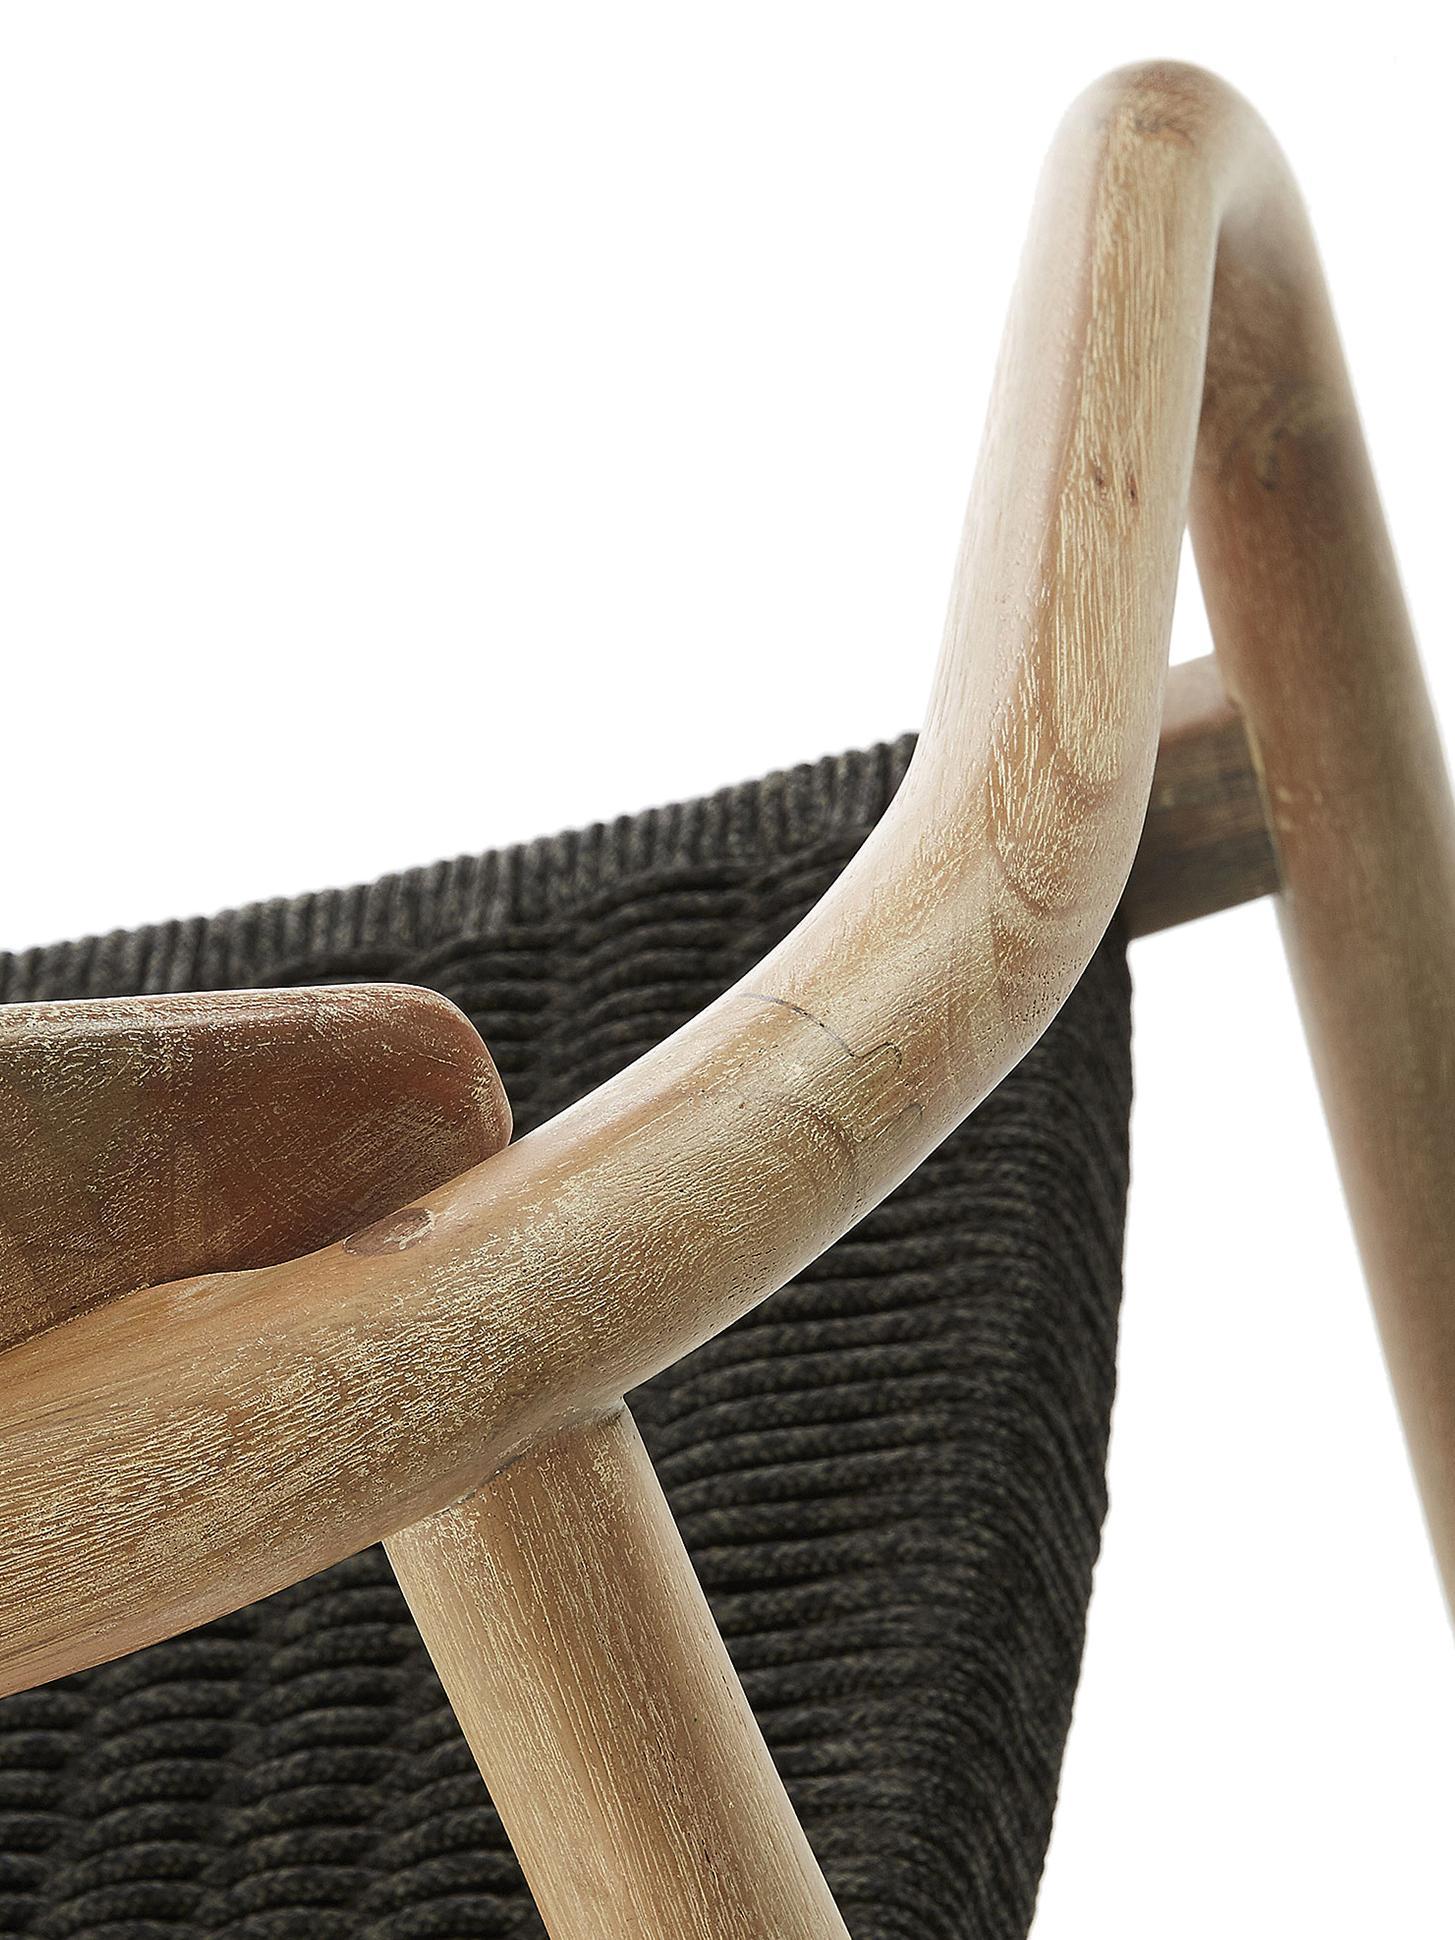 Armstoel Nina van massief hout, Frame: massief eucalyptushout, Zitvlak: polyester, UV-bestendig, Bruin, donkergrijs, B 56 x D 53 cm